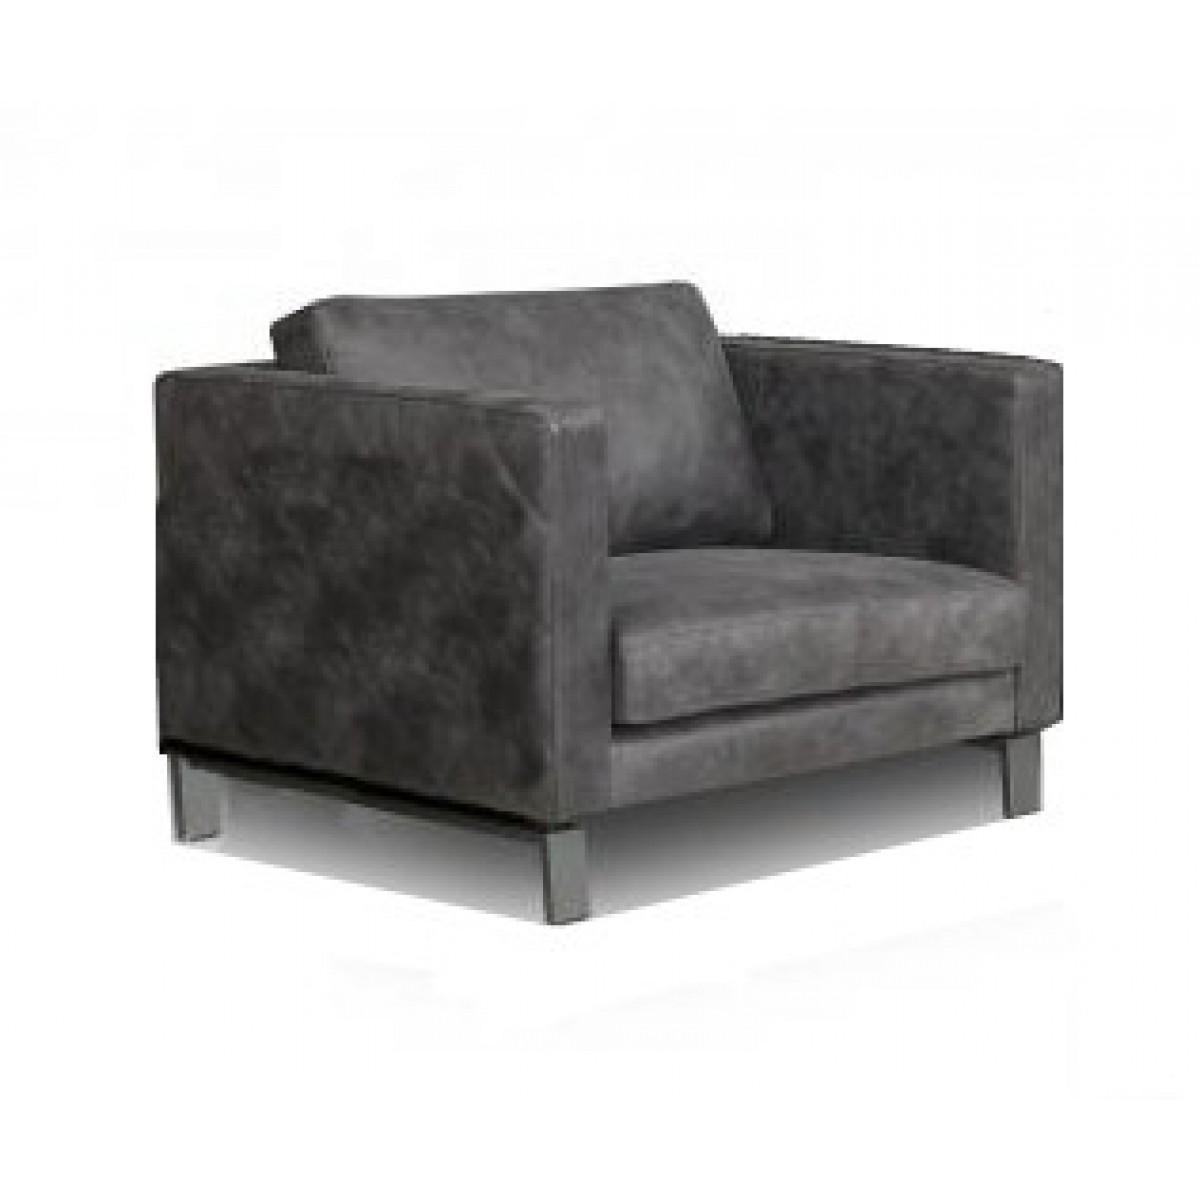 Loveseat sessel leder  Bonbeno Sessel | I Live Design Preisgünstig online Moebel kaufen